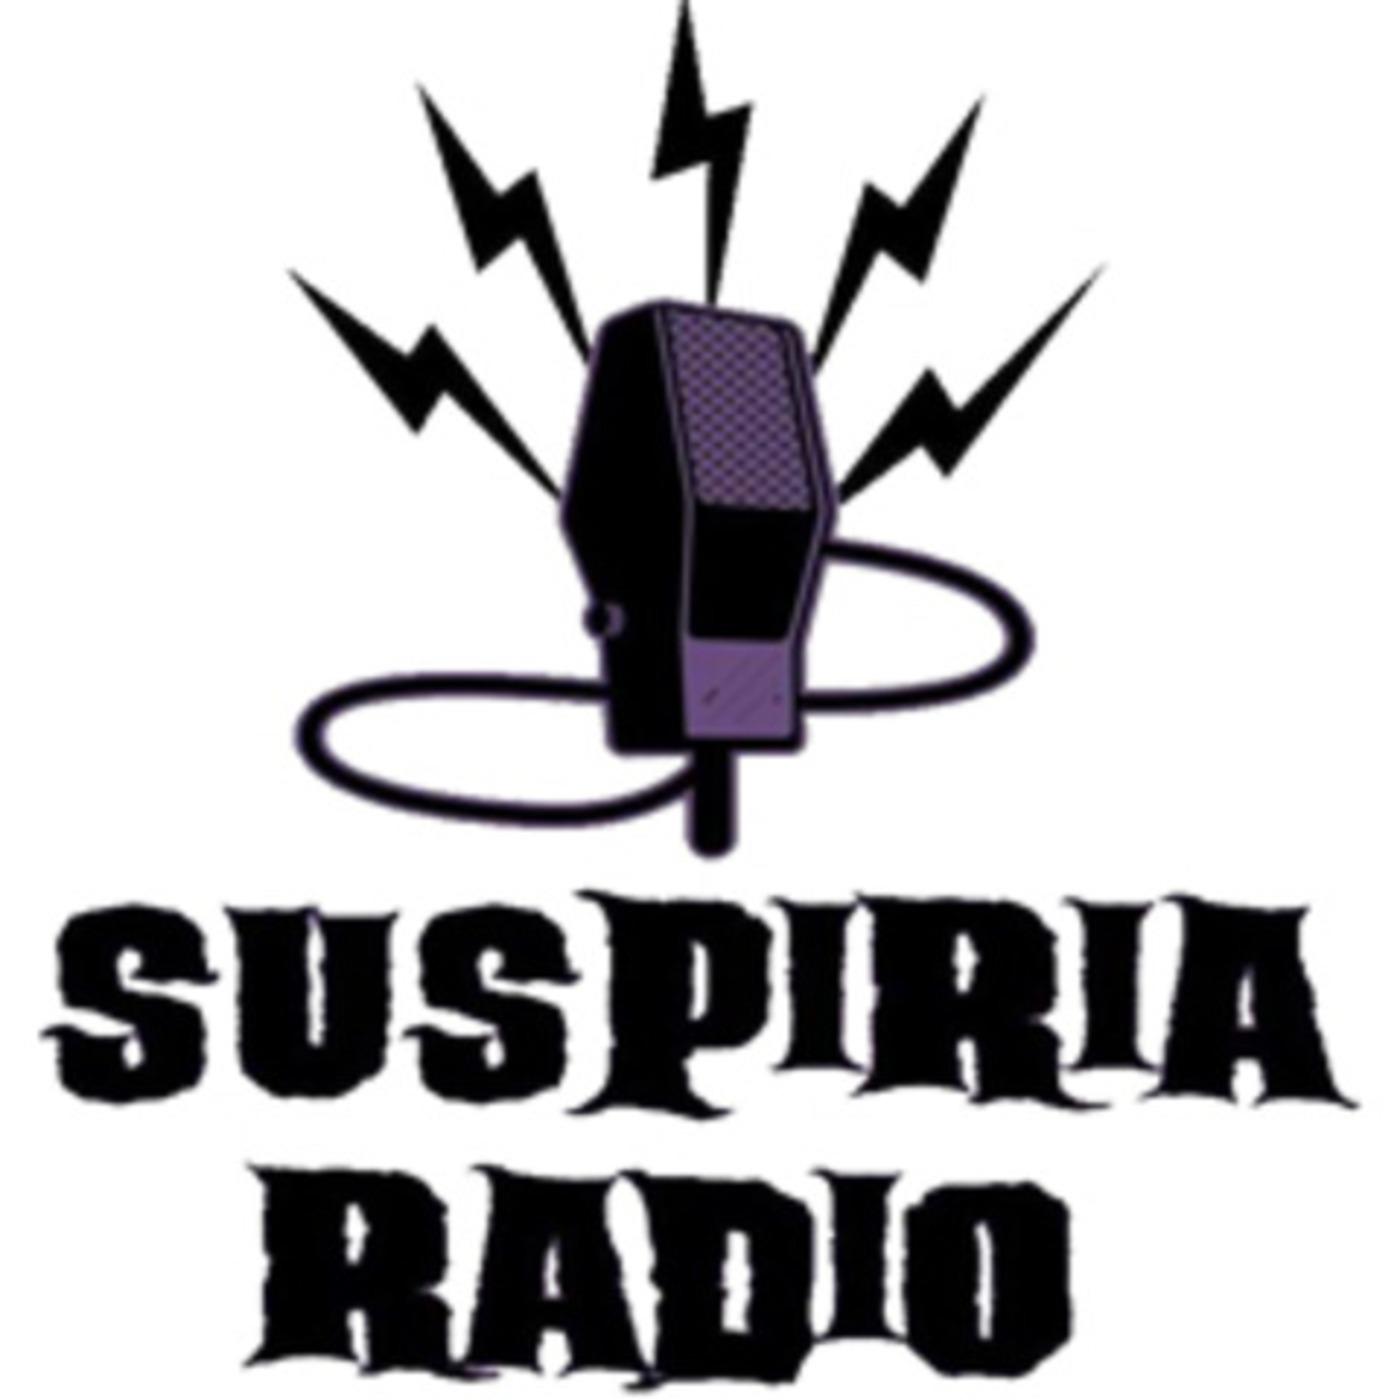 Suspiria Radio Programas (GothRadio)